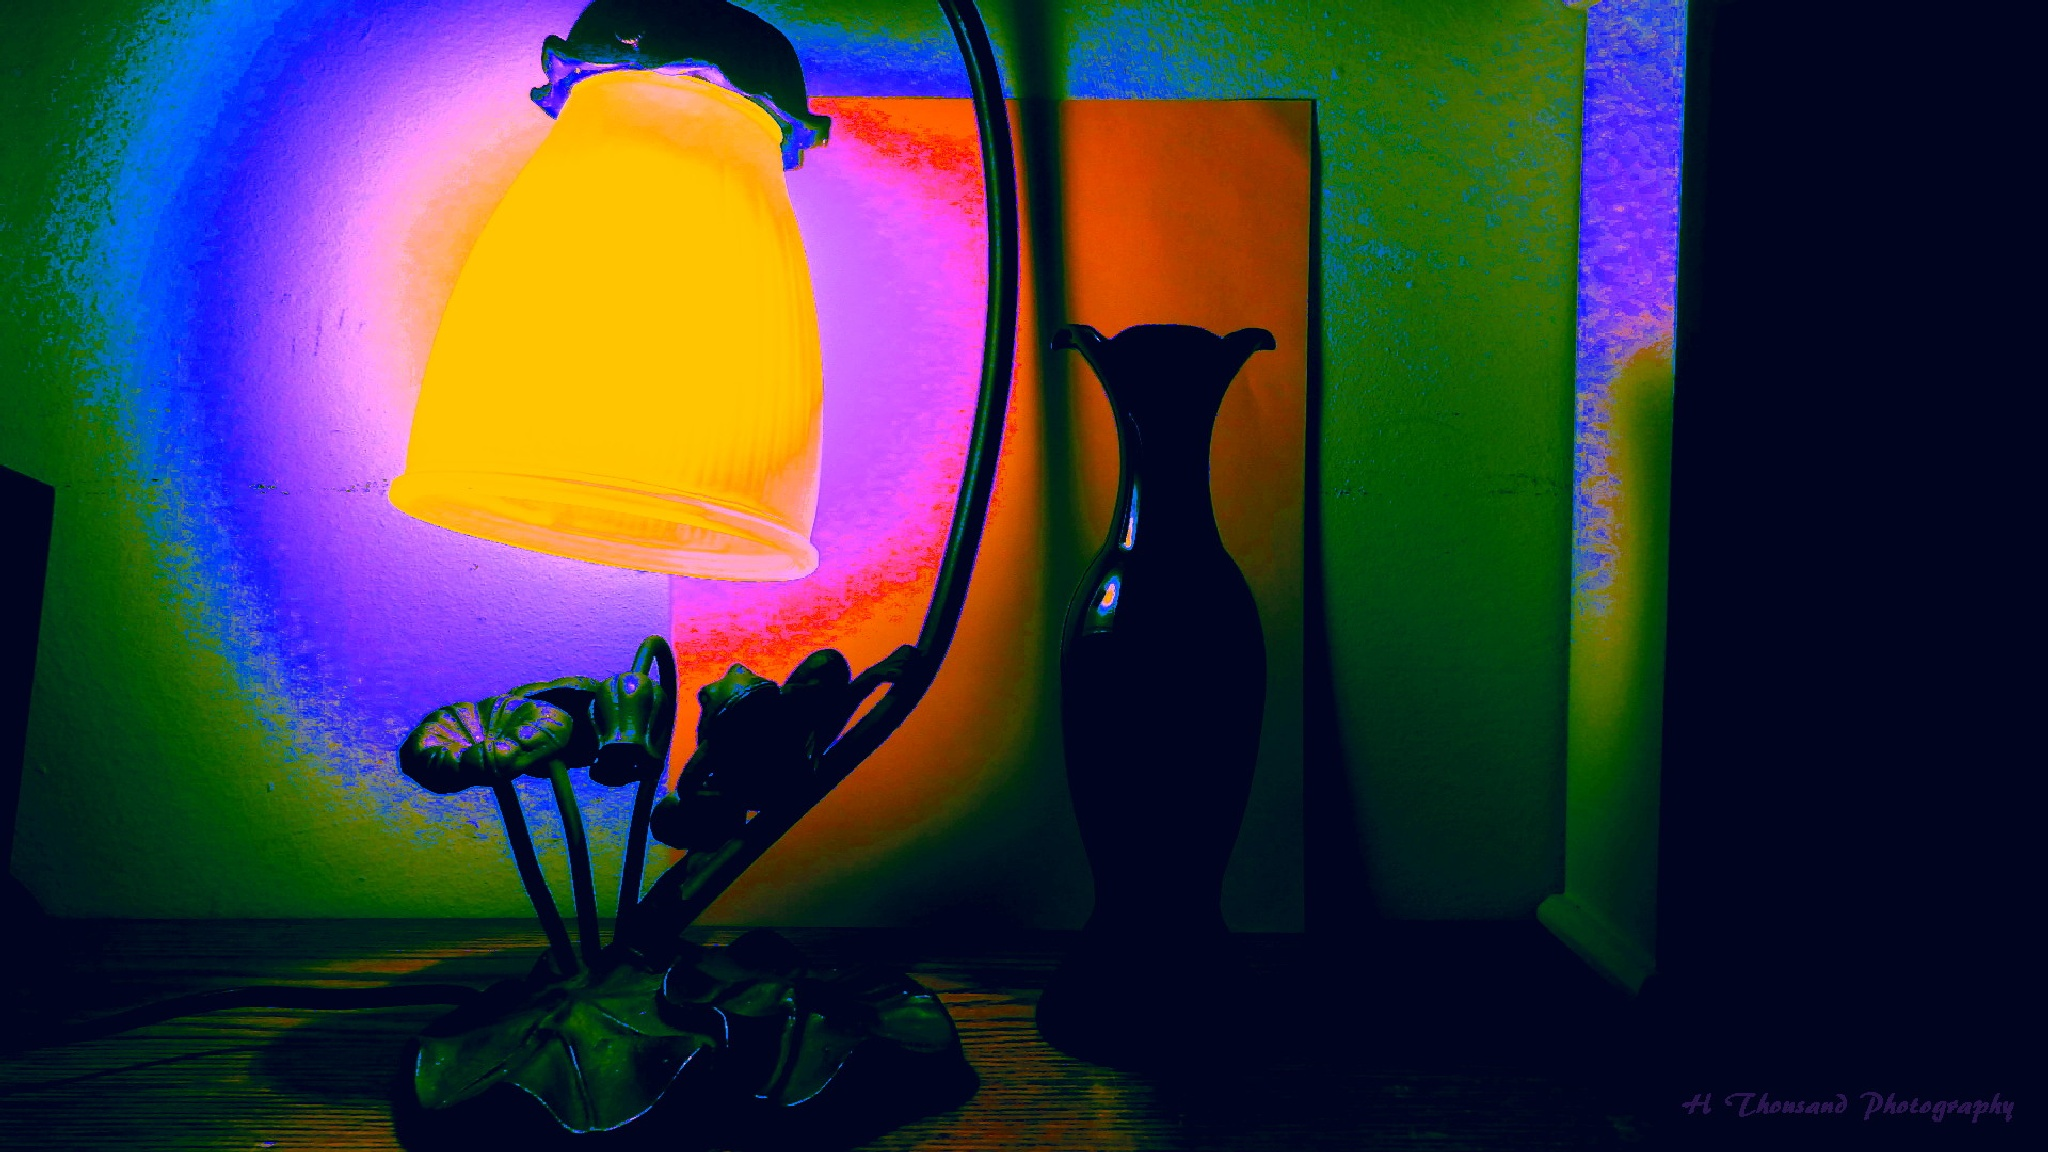 Frog Lamp and Vase by hrthousandjr